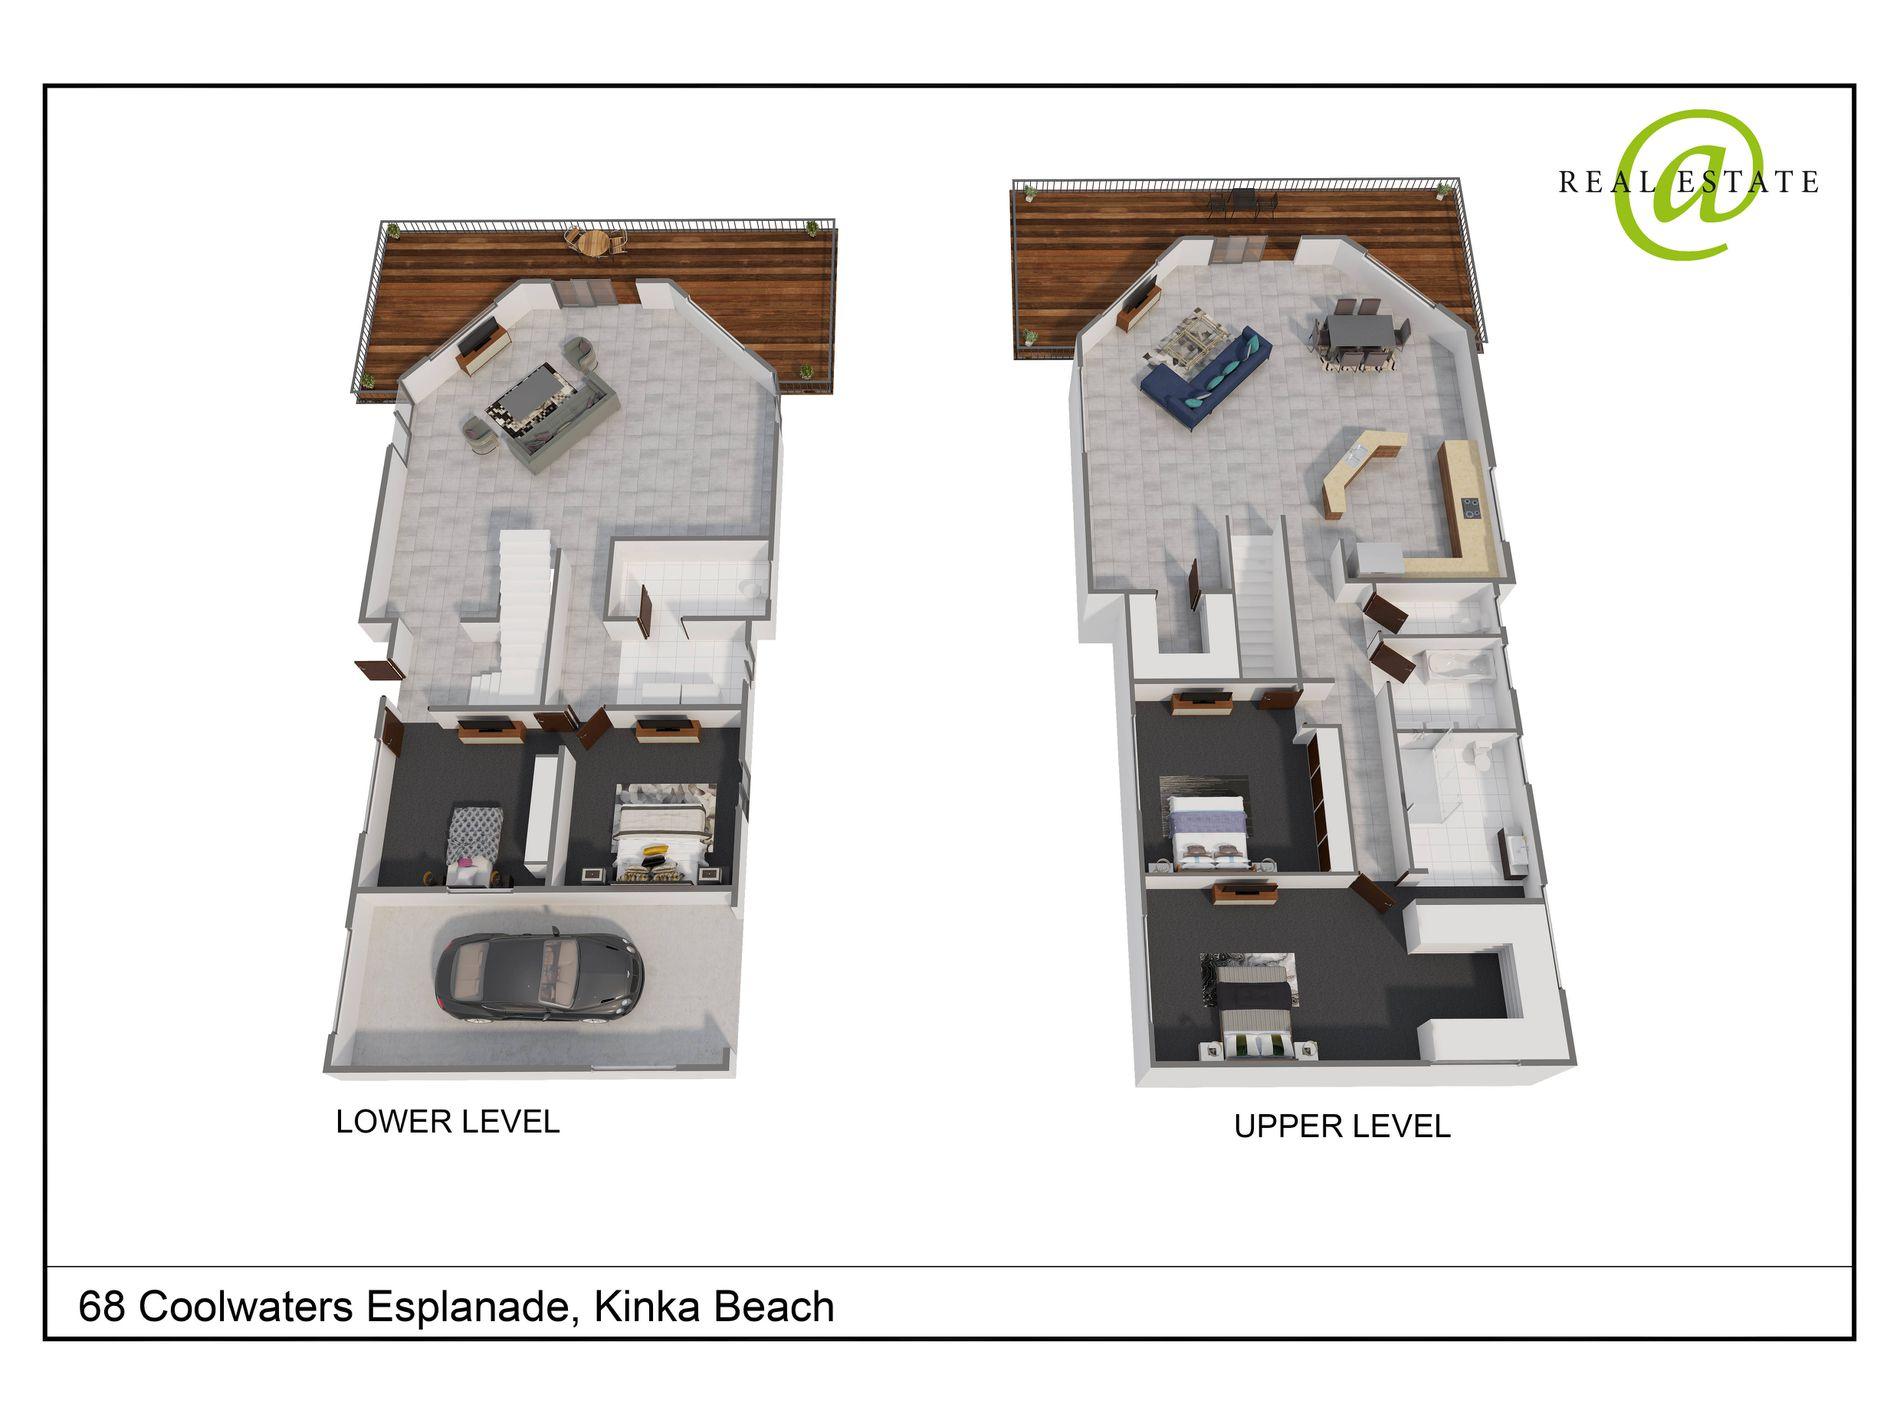 68 Coolwaters Esplanade, Kinka Beach